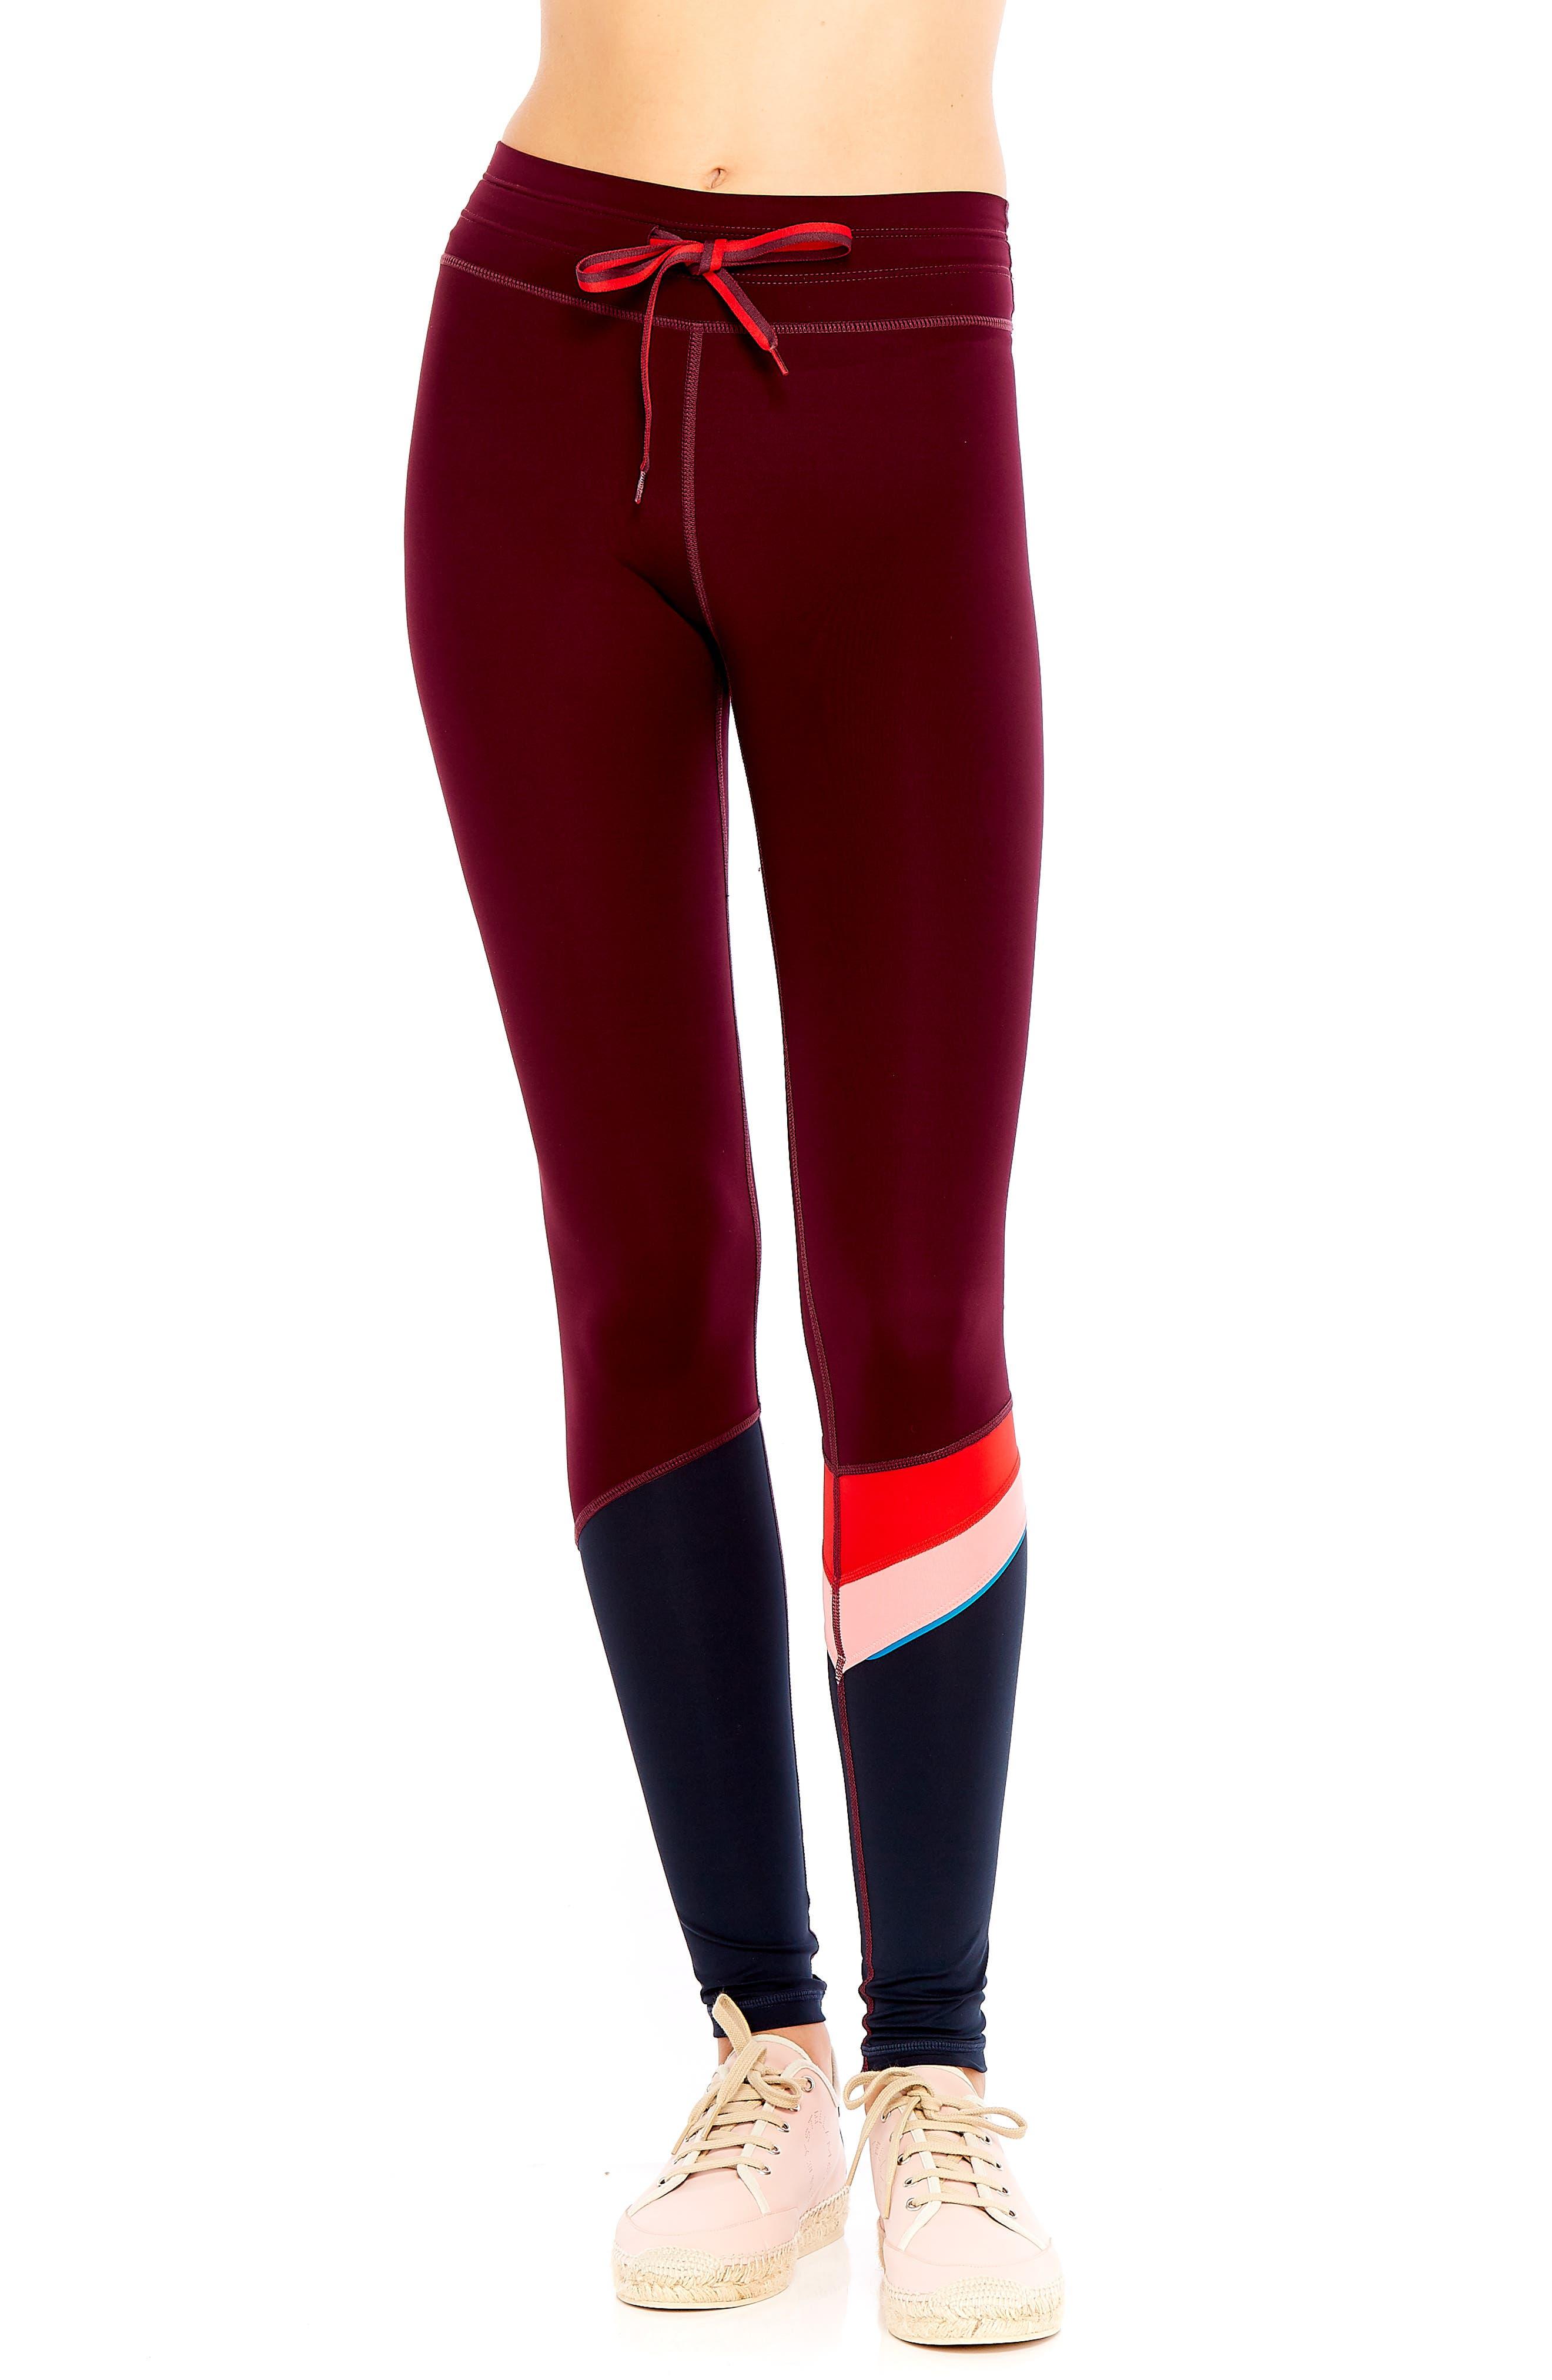 The Upside Maroon Retro Yoga Pants